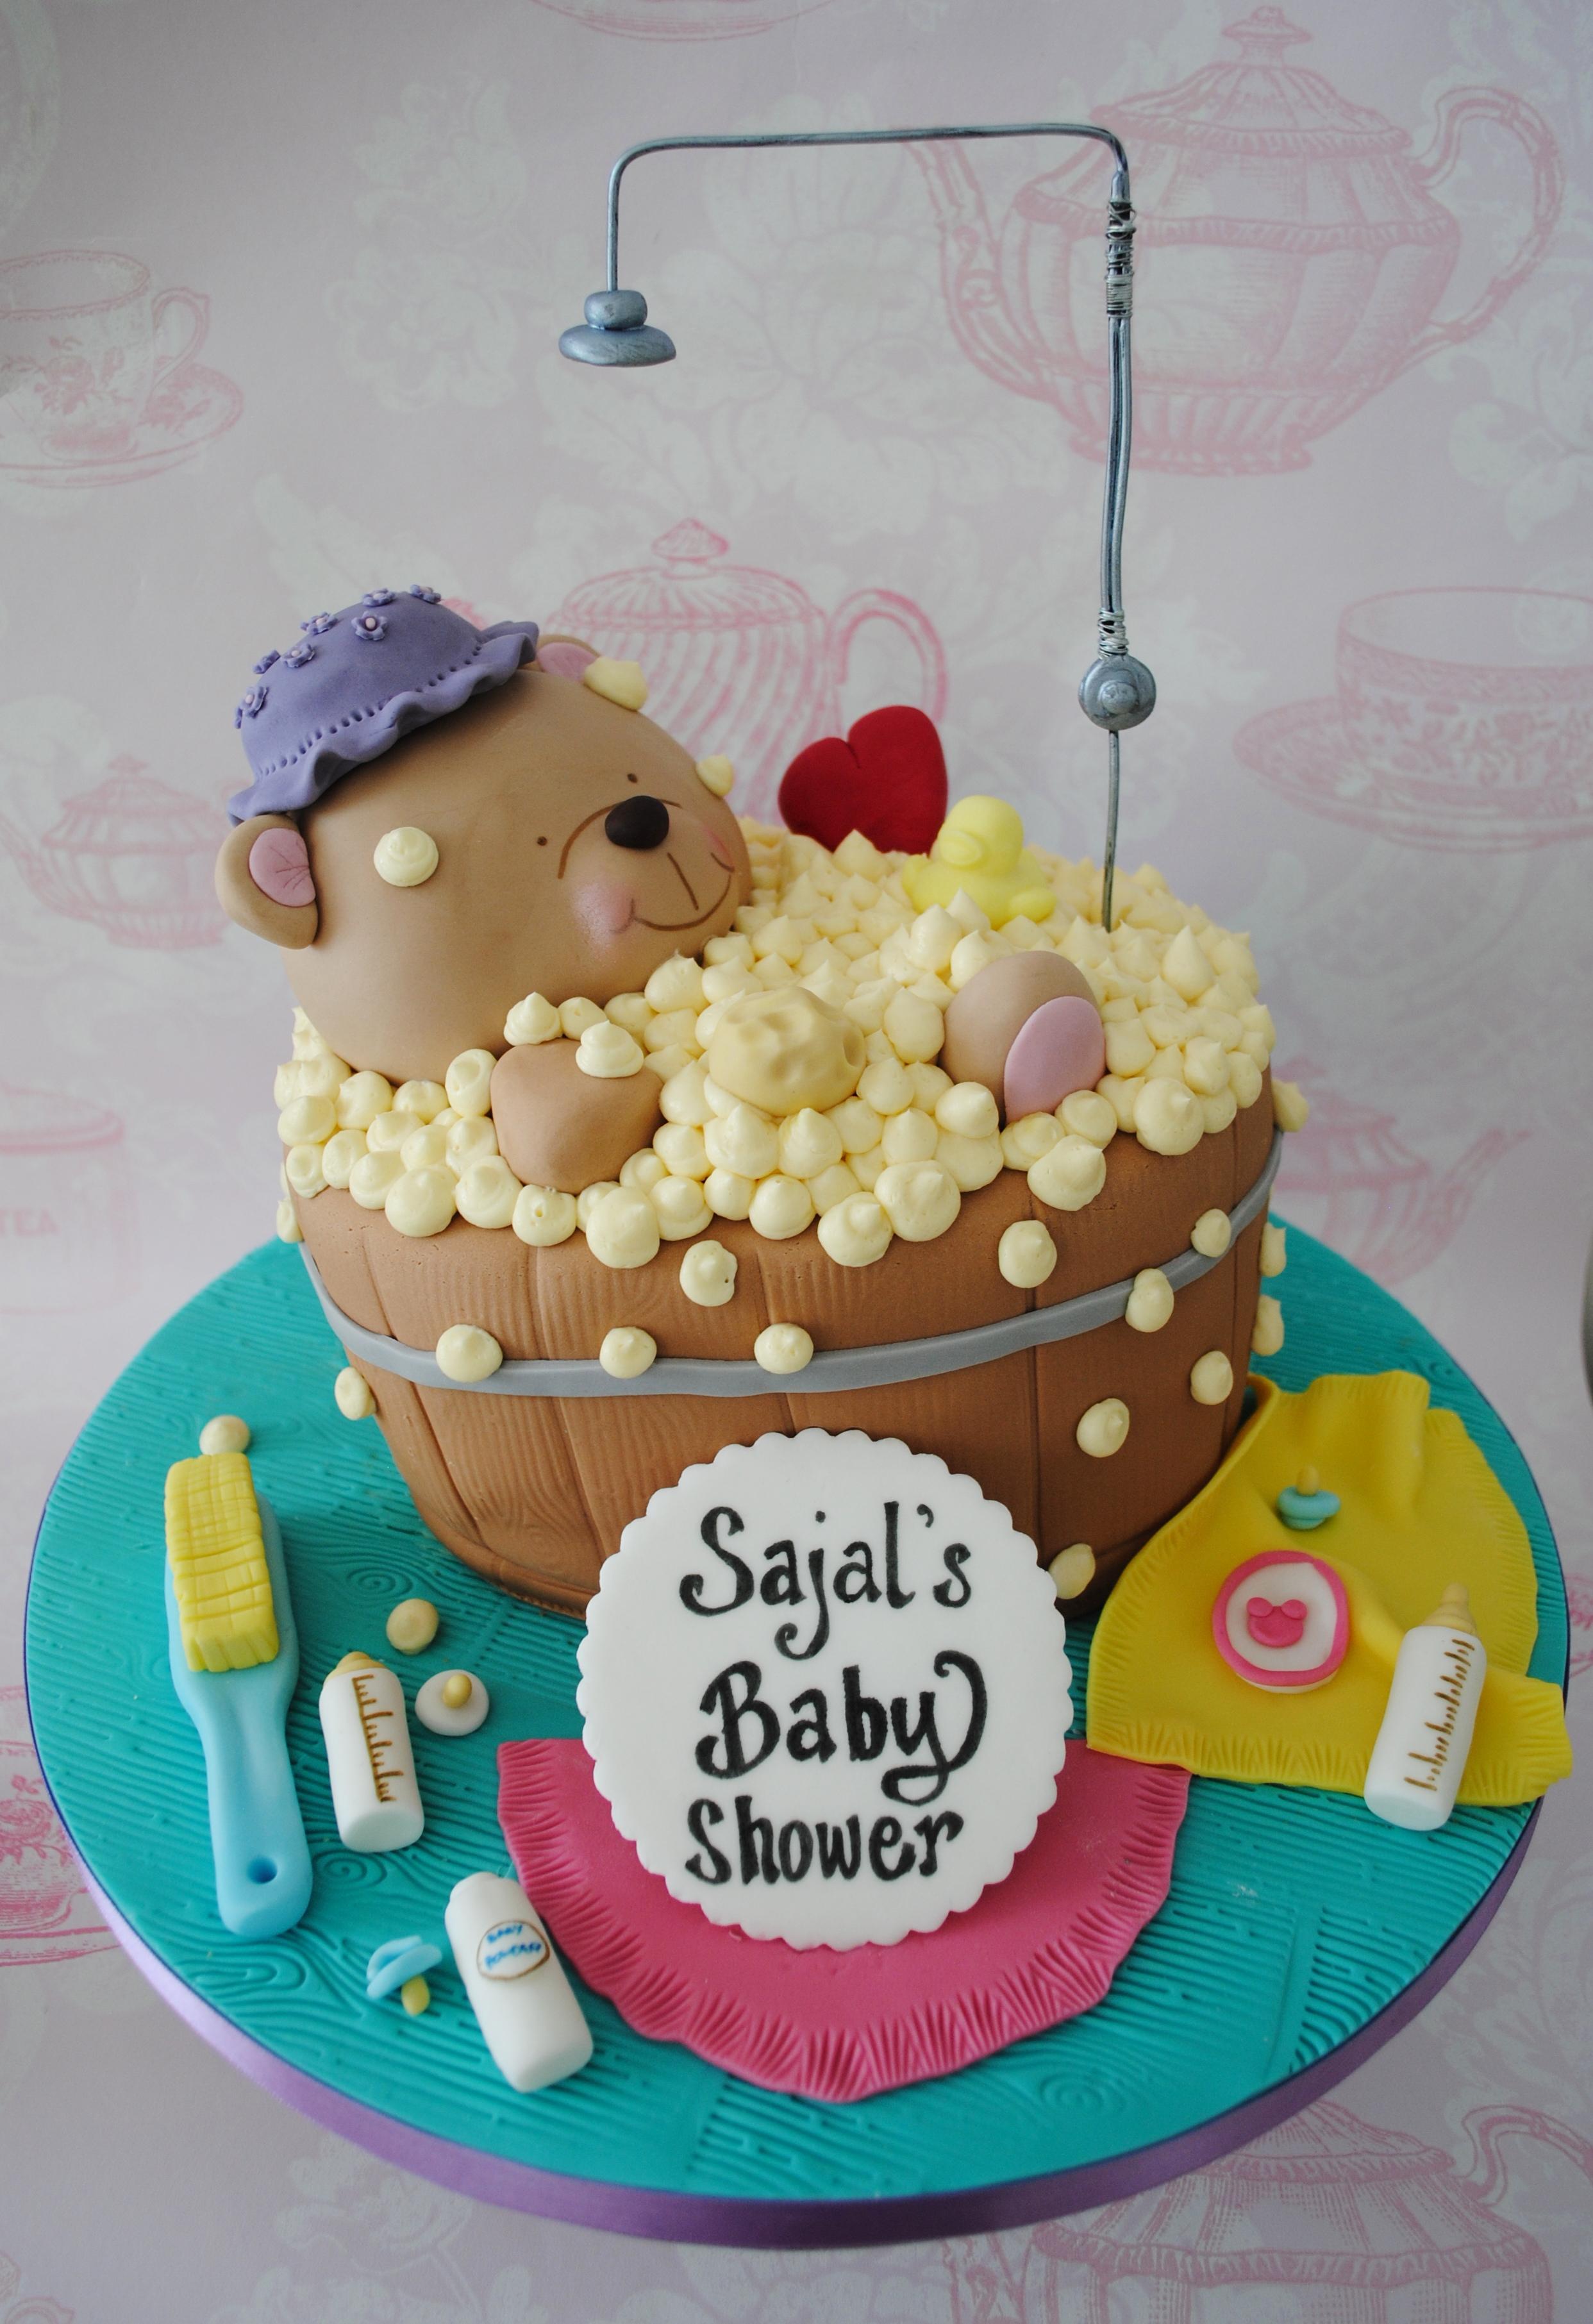 Baby Shower Cupcakes Ideas Uk : Cupcakes Gallery Cupcakes London Miss Cupcakes